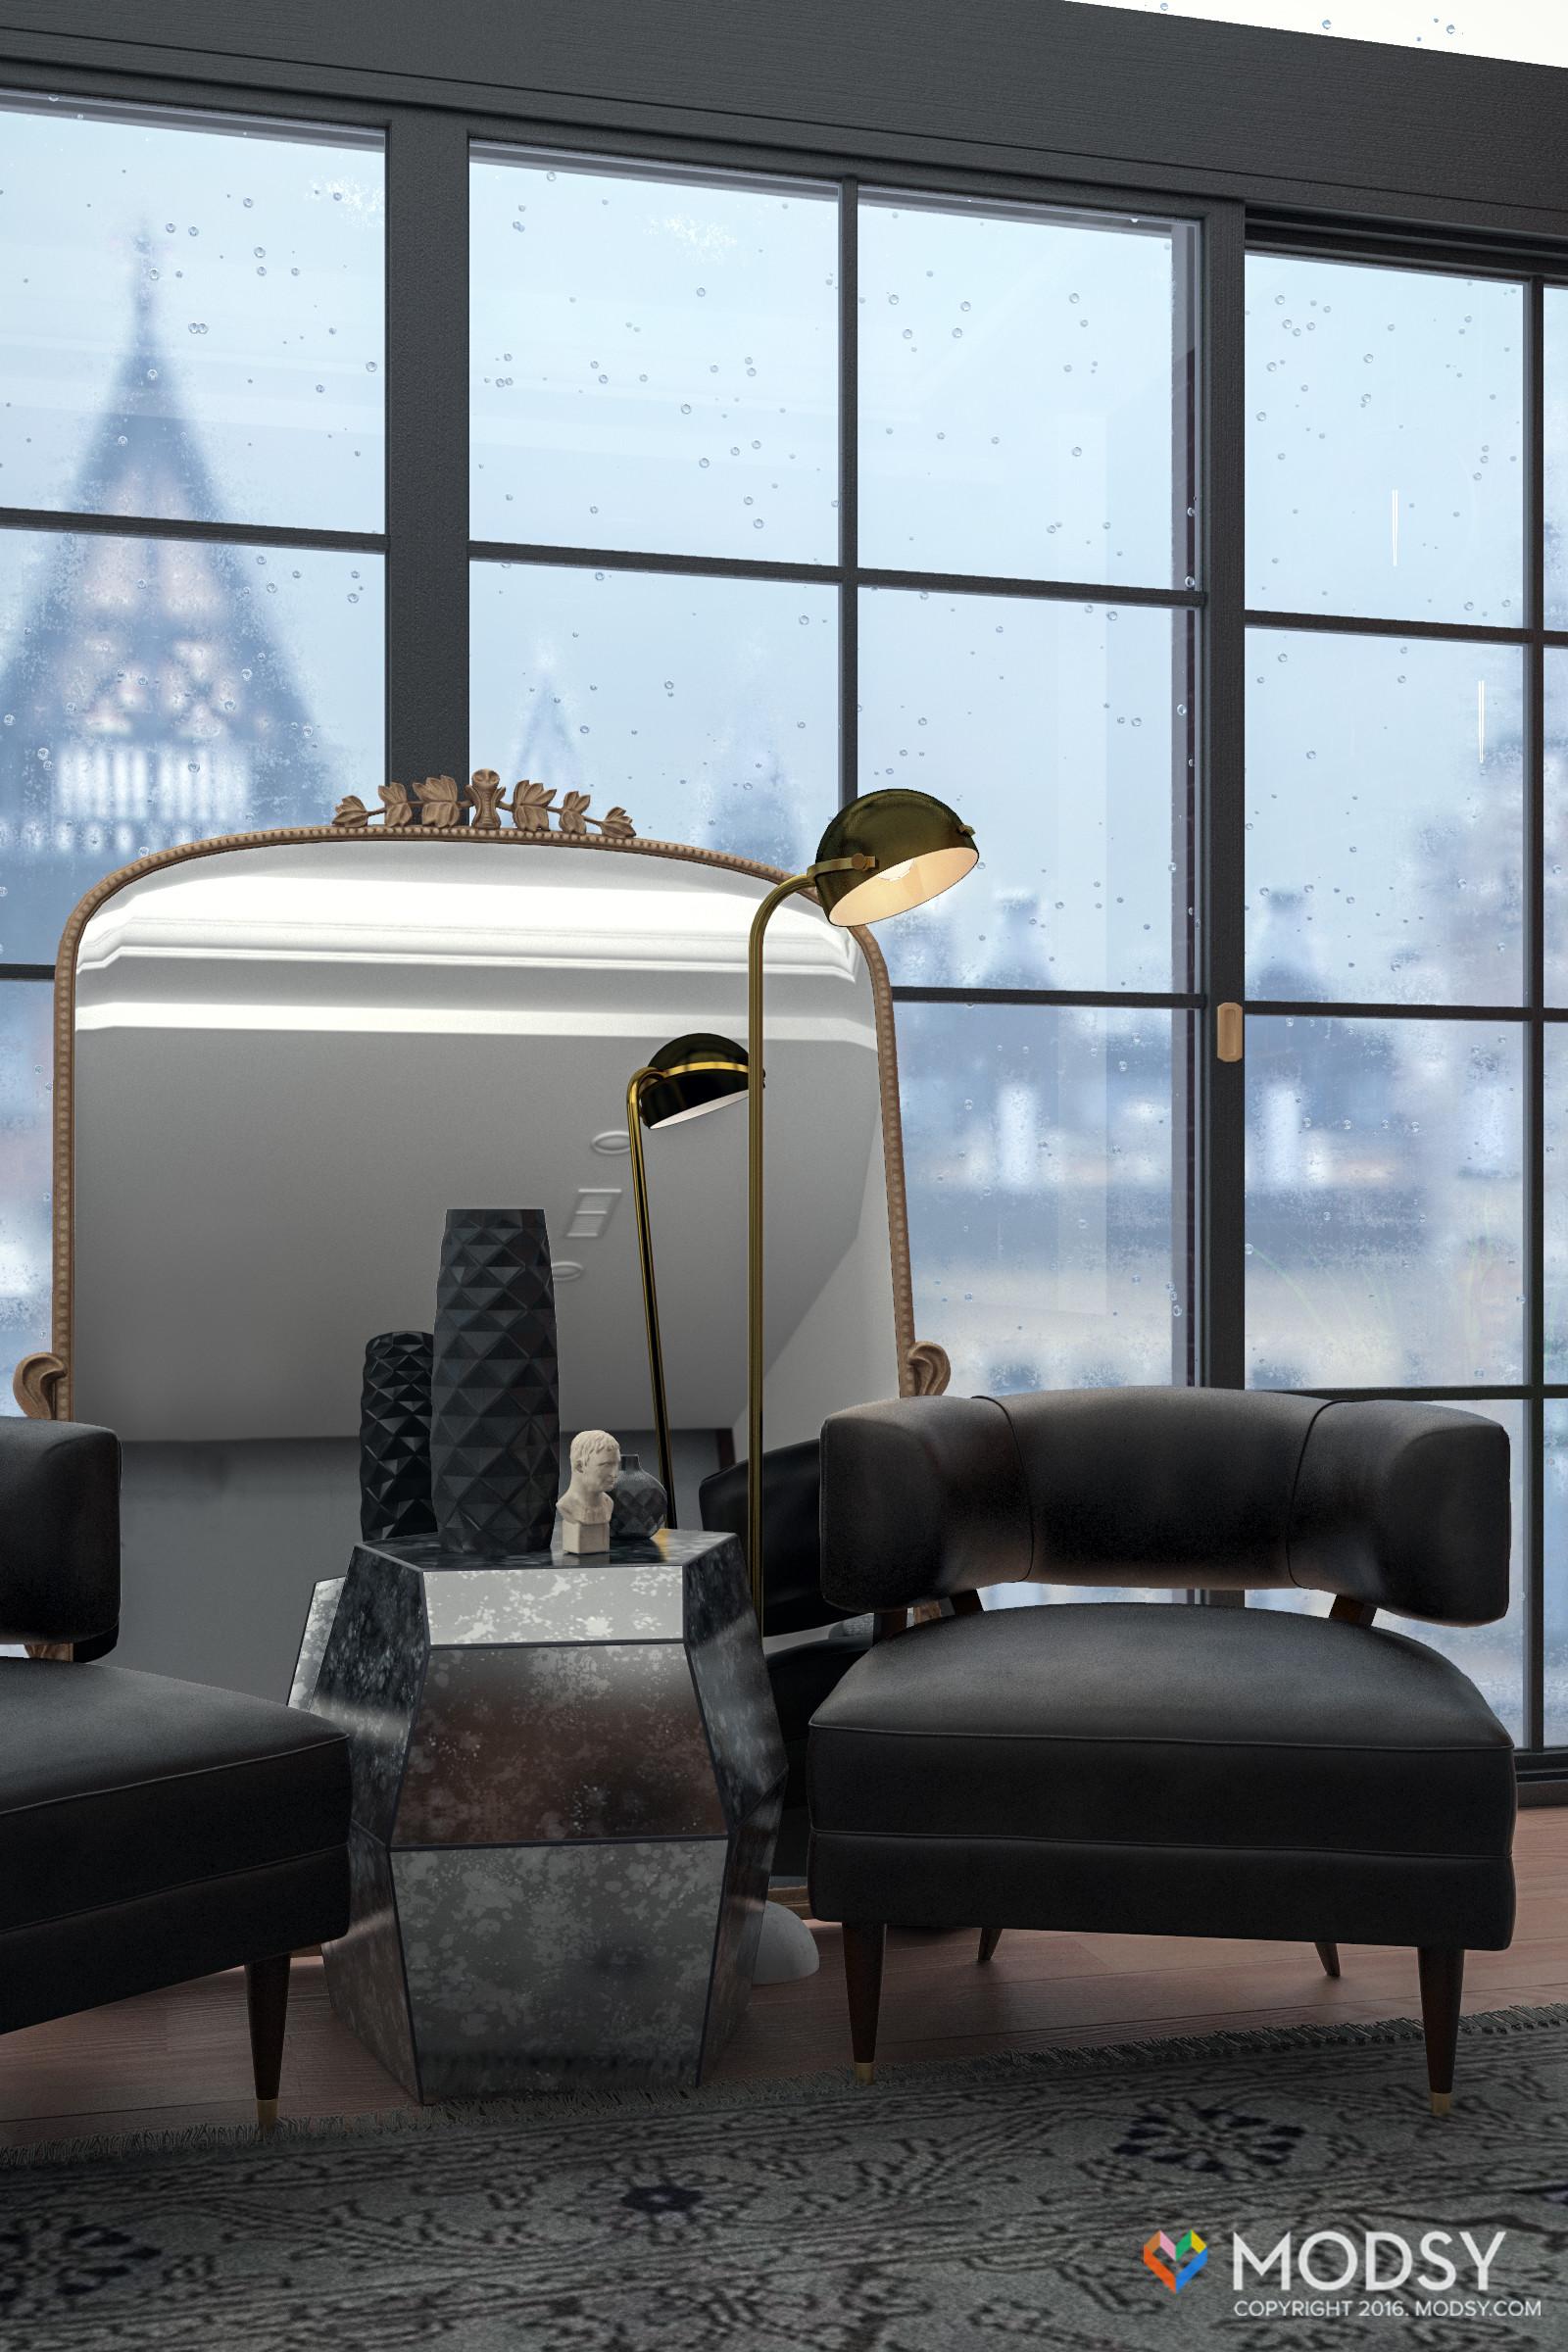 ArtStation - London Loft, MODSY Design